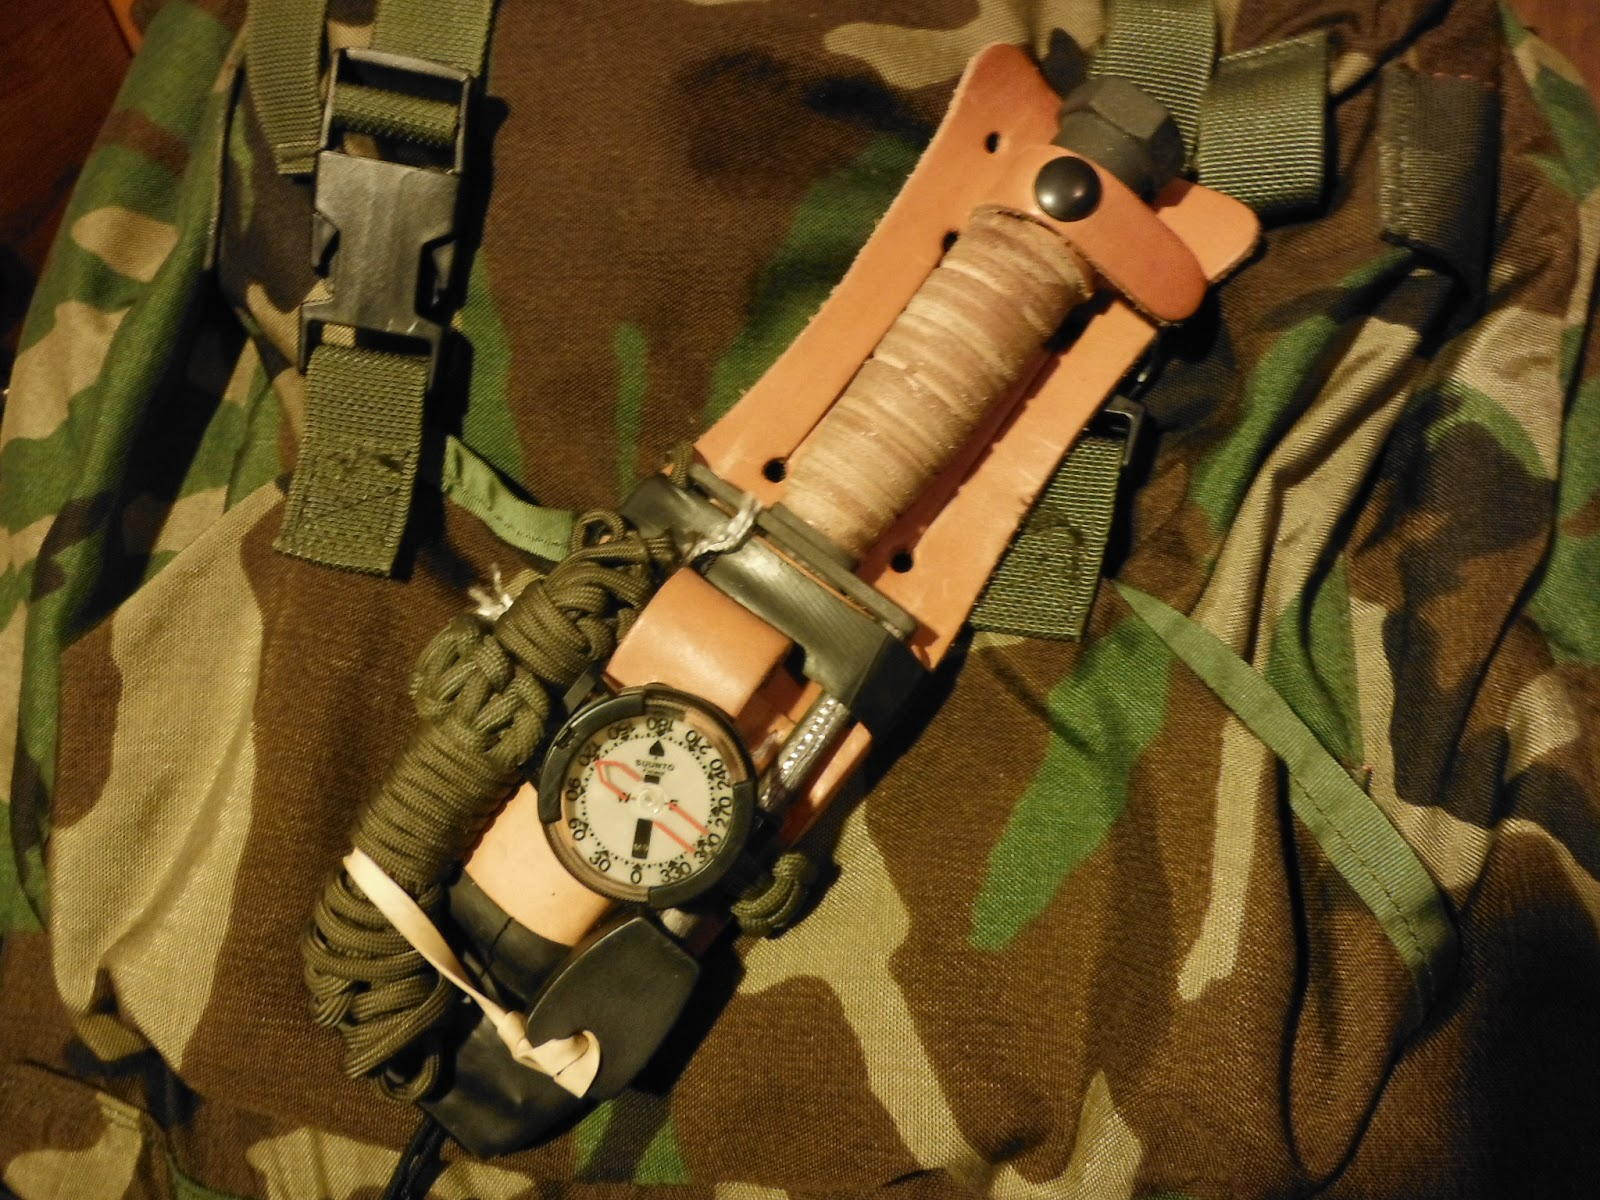 360survival Gi Survival Pilot Knife Ontario 499